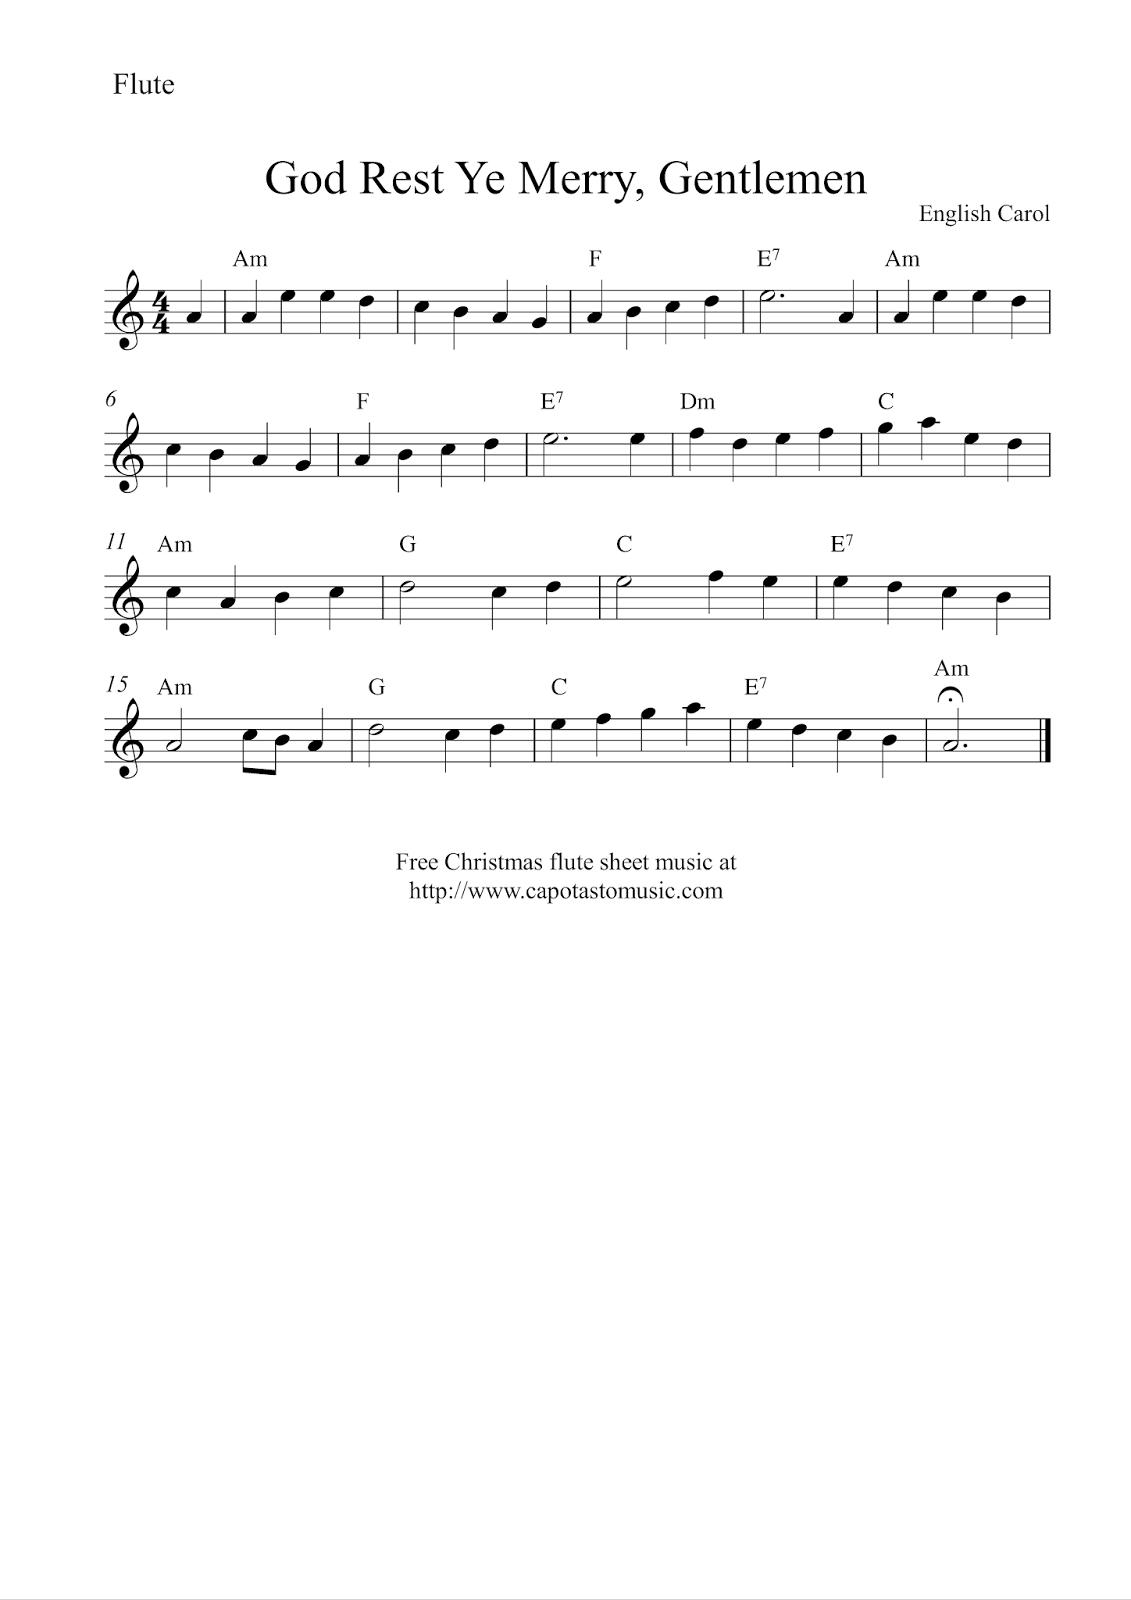 Free Printable Sheet Music Free Christmas Flute Sheet Music God Rest Ye Merry Gentlemen